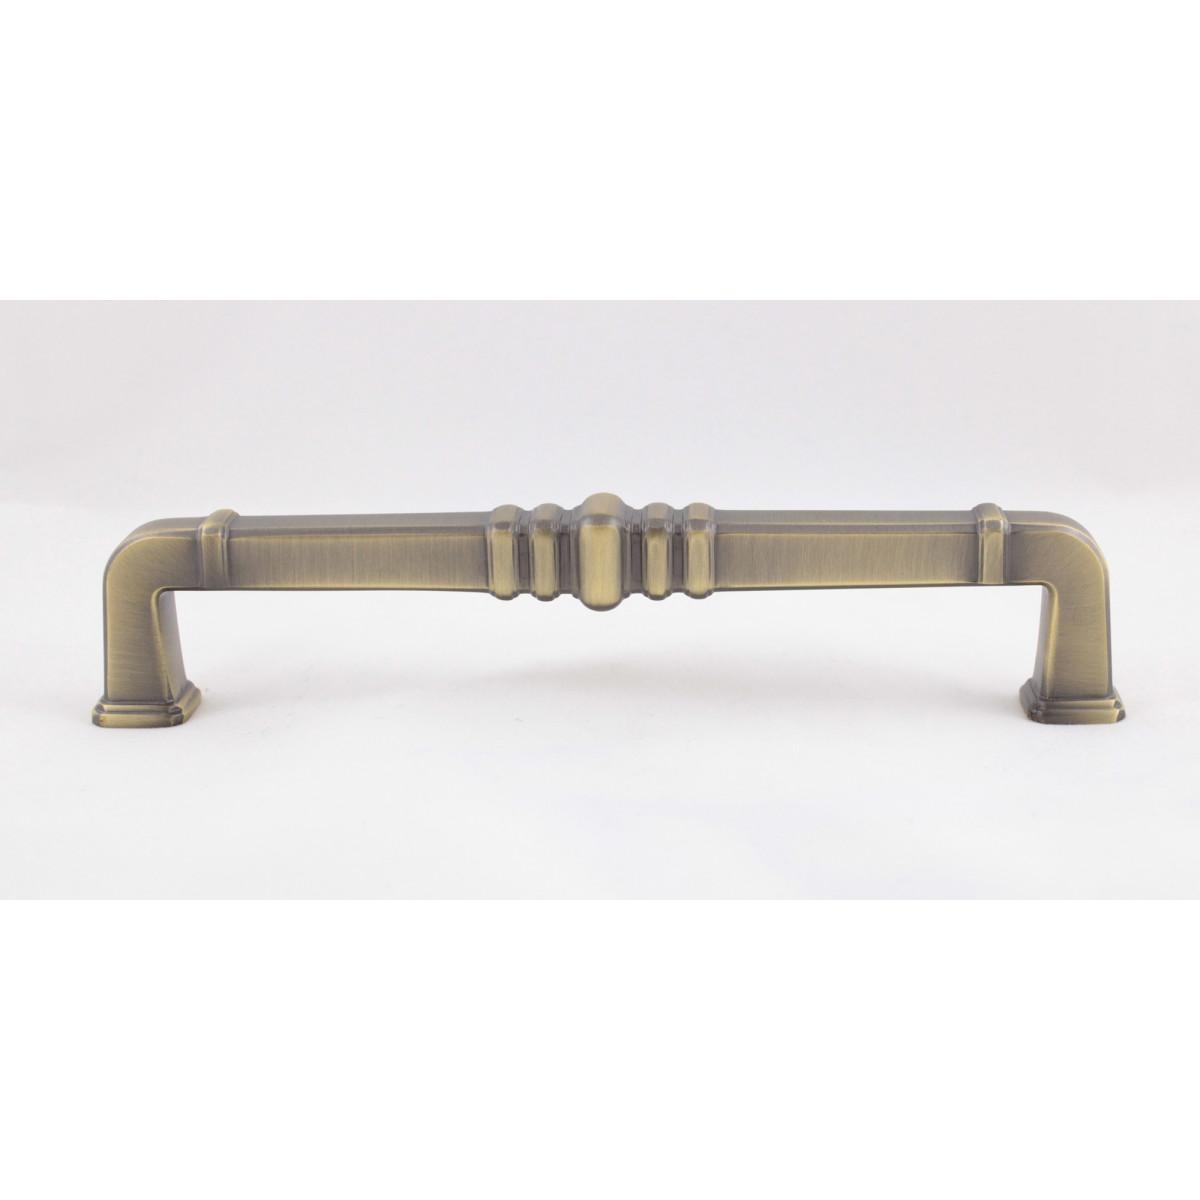 Ручка-Скоба Modda 160 Металл Бронза Otto-14-160